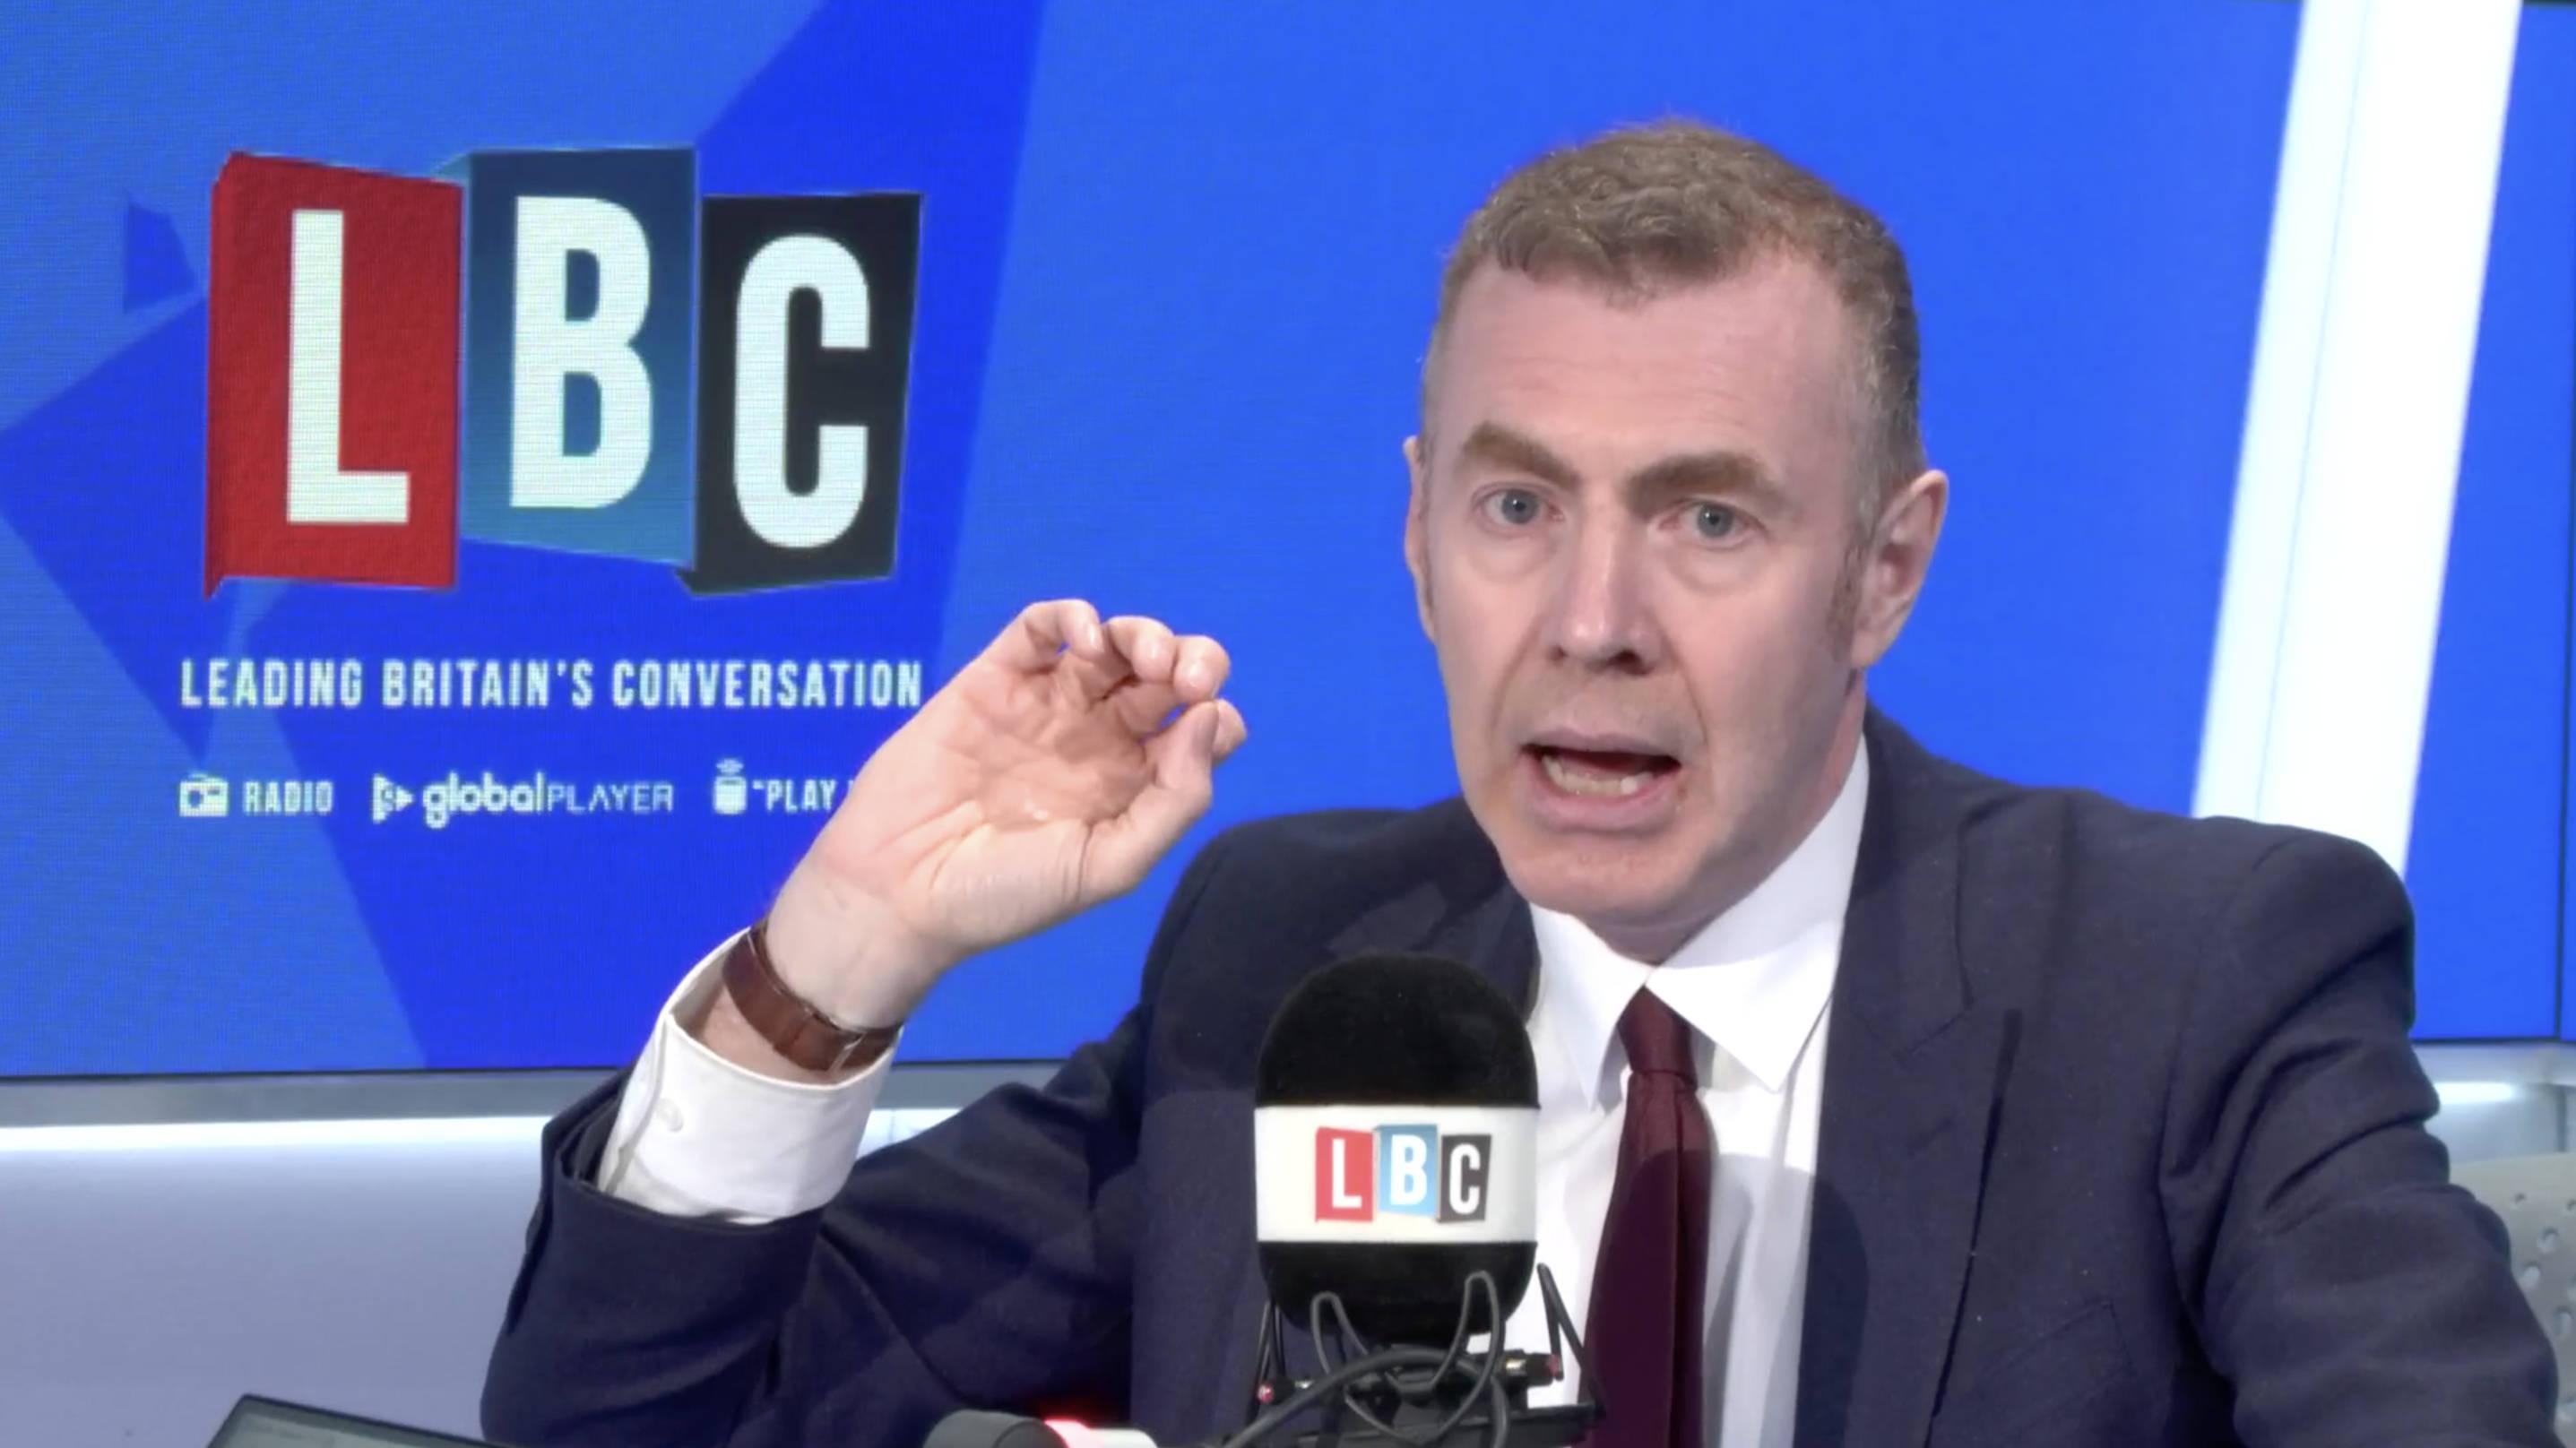 Plaid Cymru leader tells Iain Dale that Labour's dominance